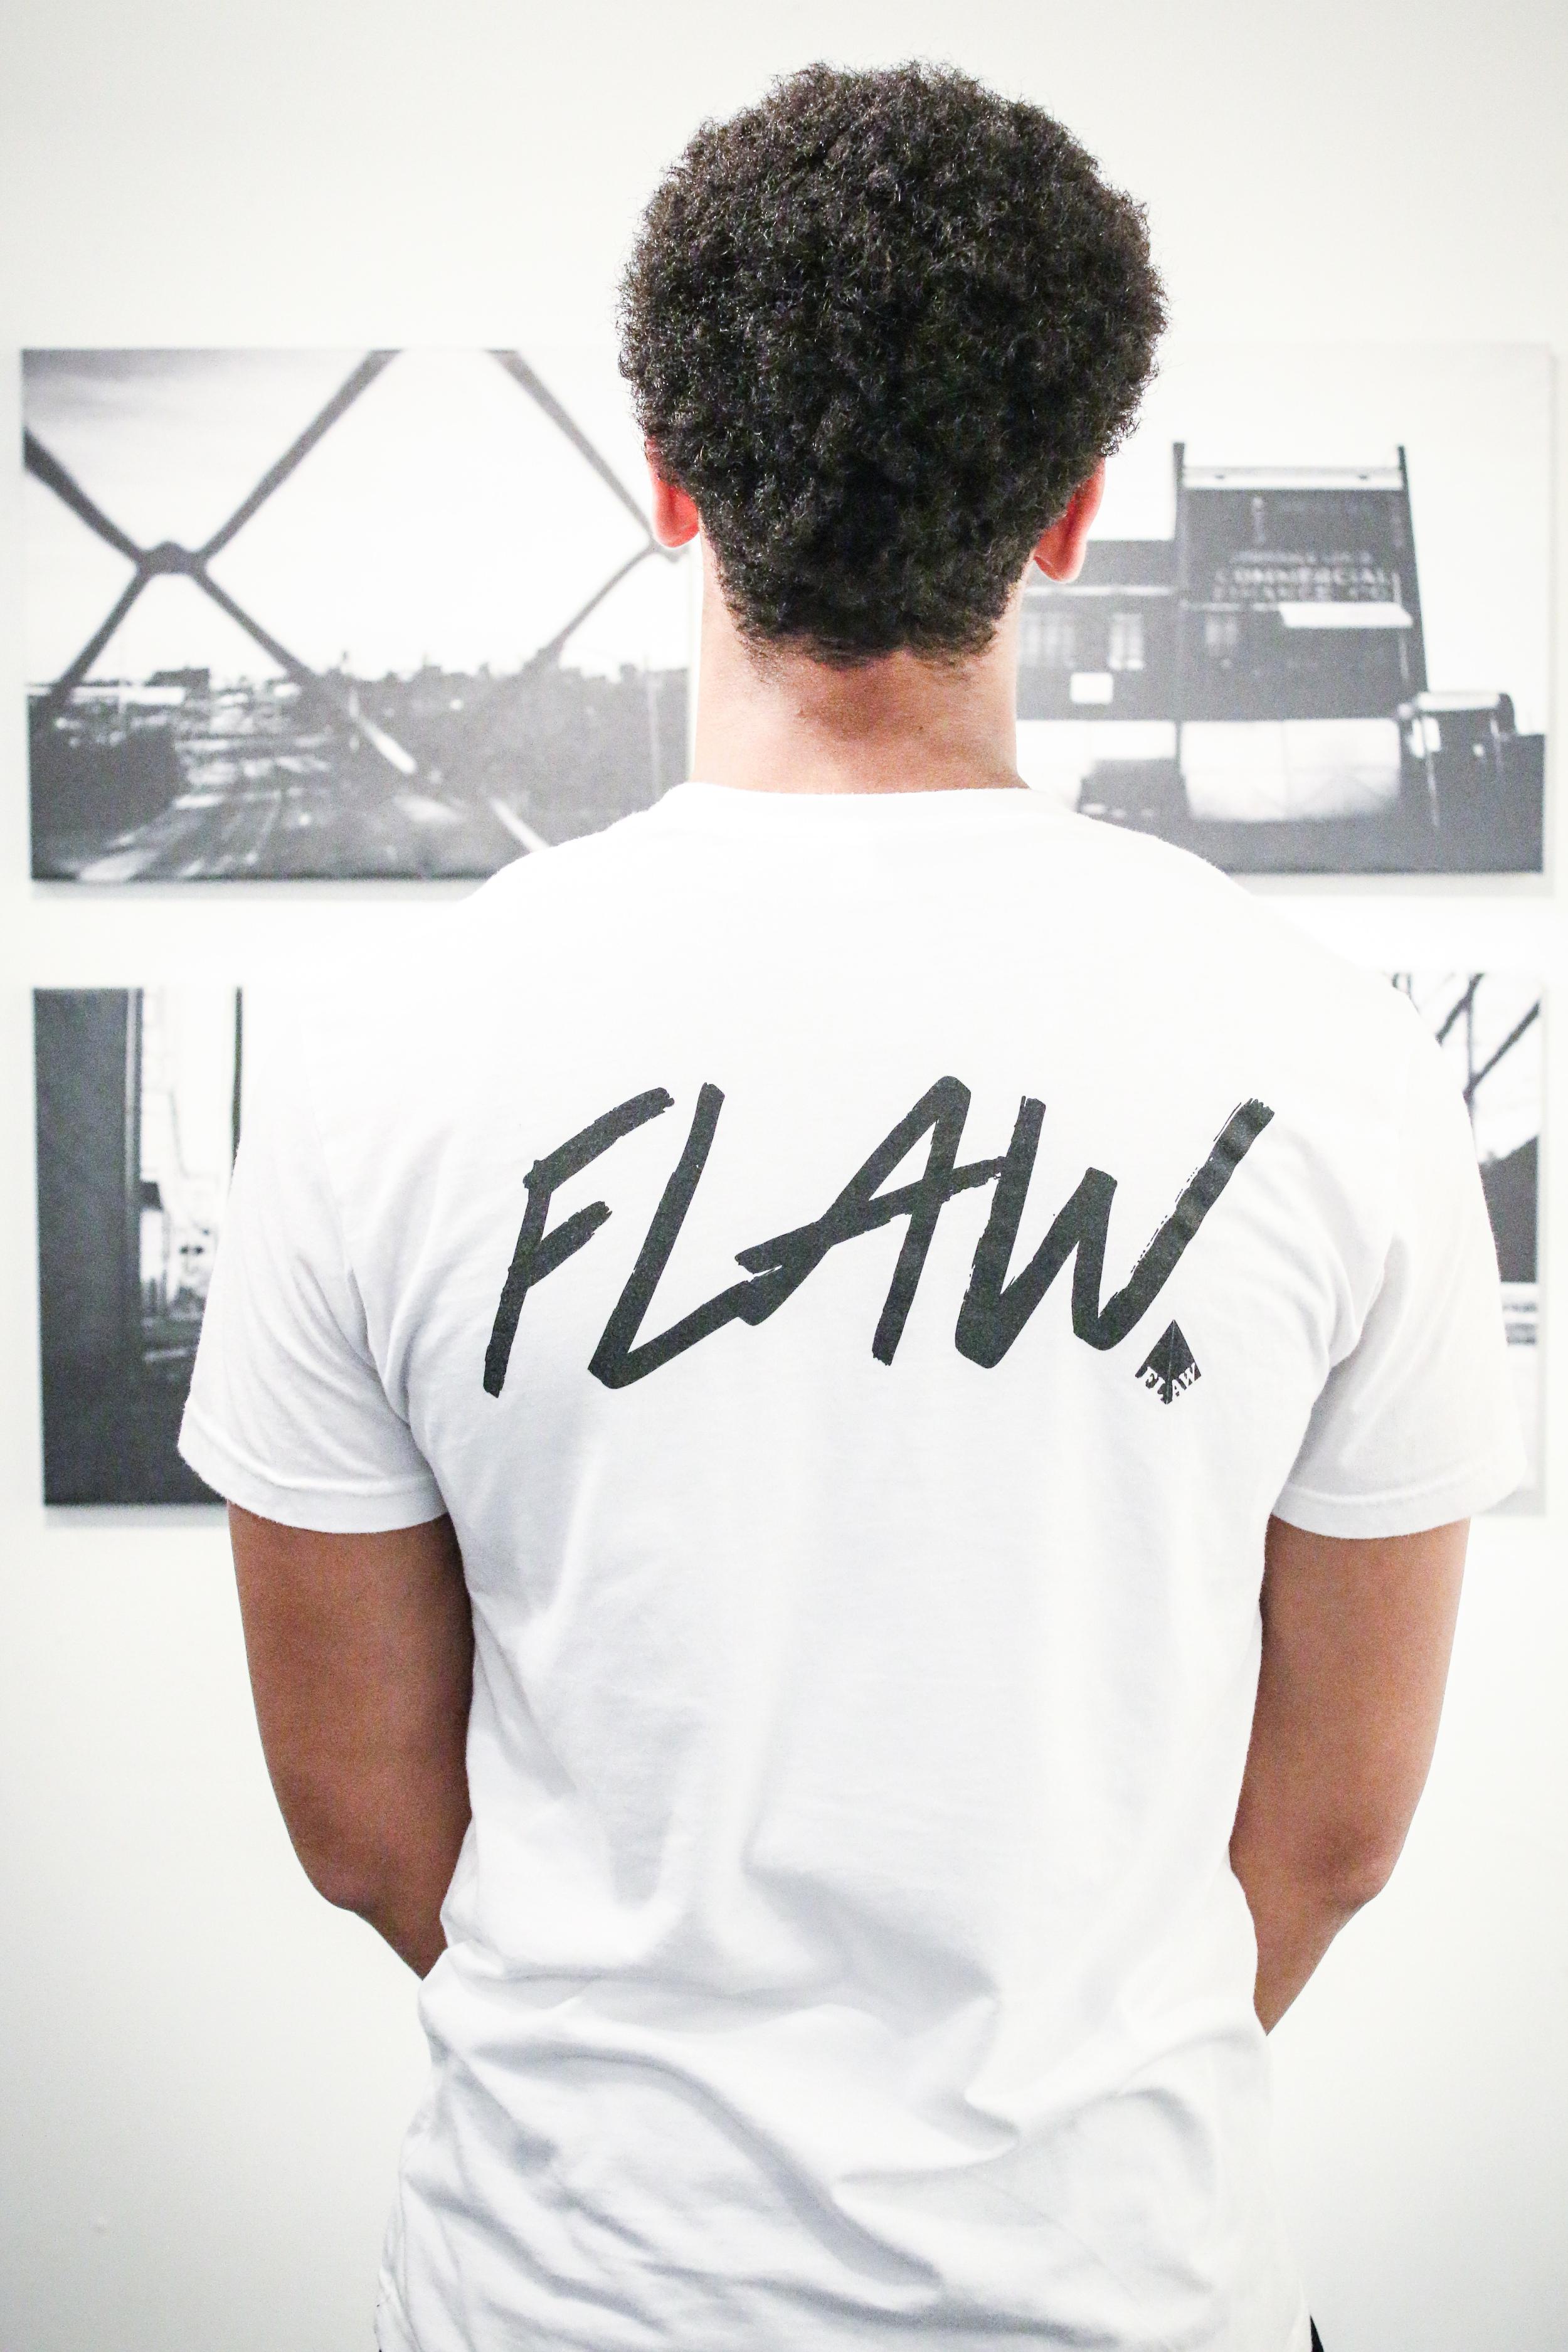 FLAW-5587.JPG